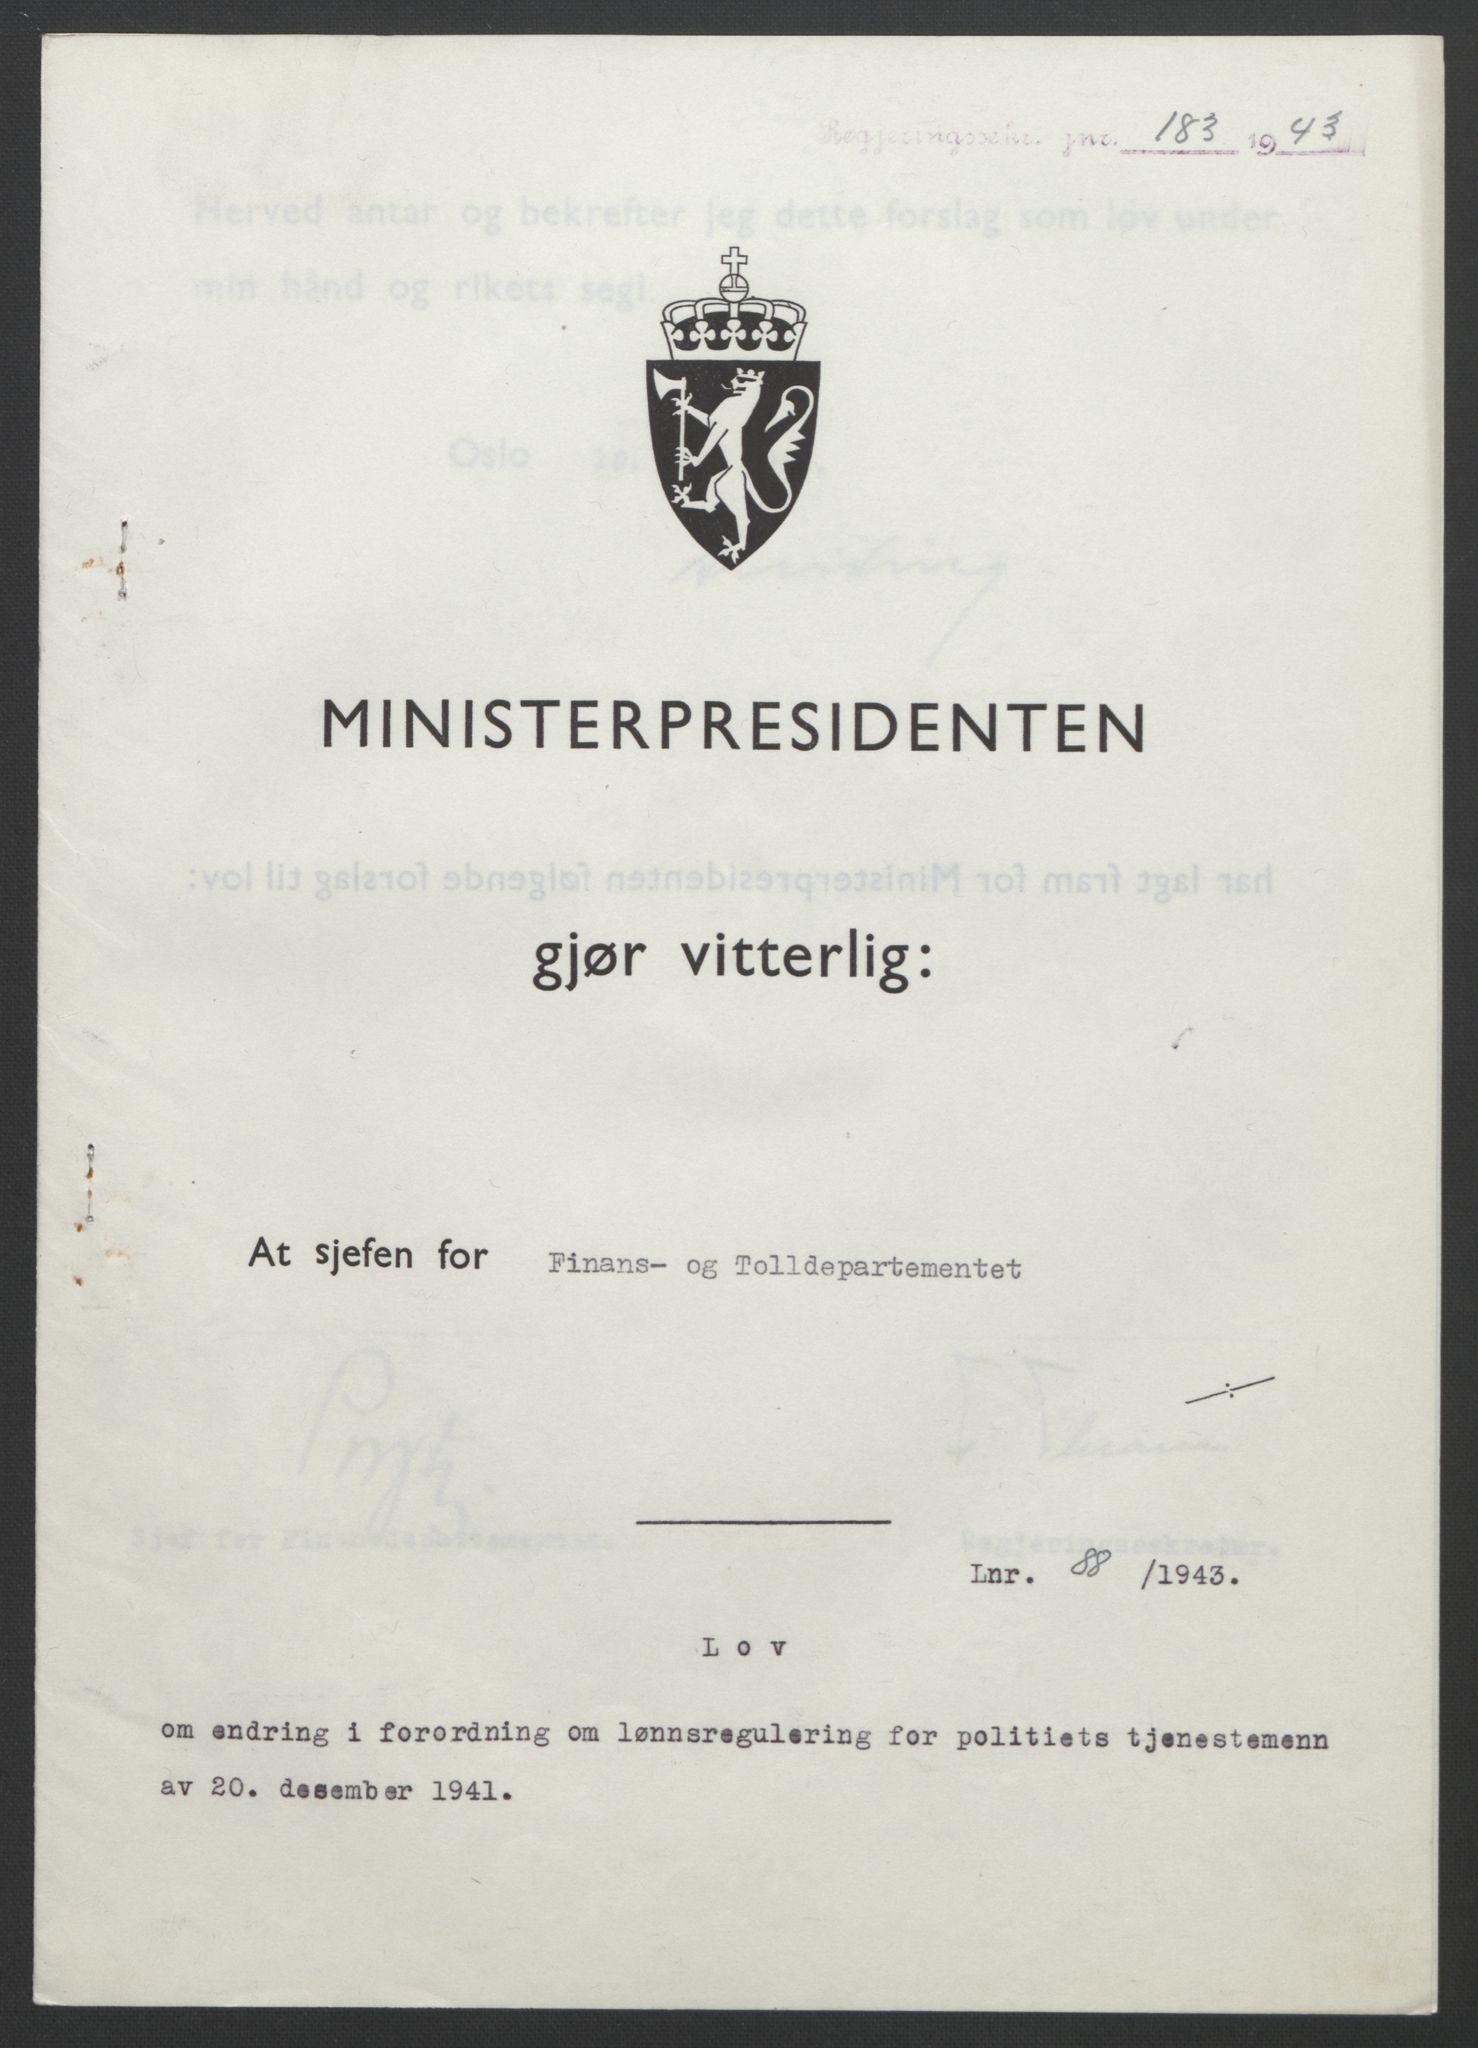 RA, NS-administrasjonen 1940-1945 (Statsrådsekretariatet, de kommisariske statsråder mm), D/Db/L0099: Lover, 1943, s. 400